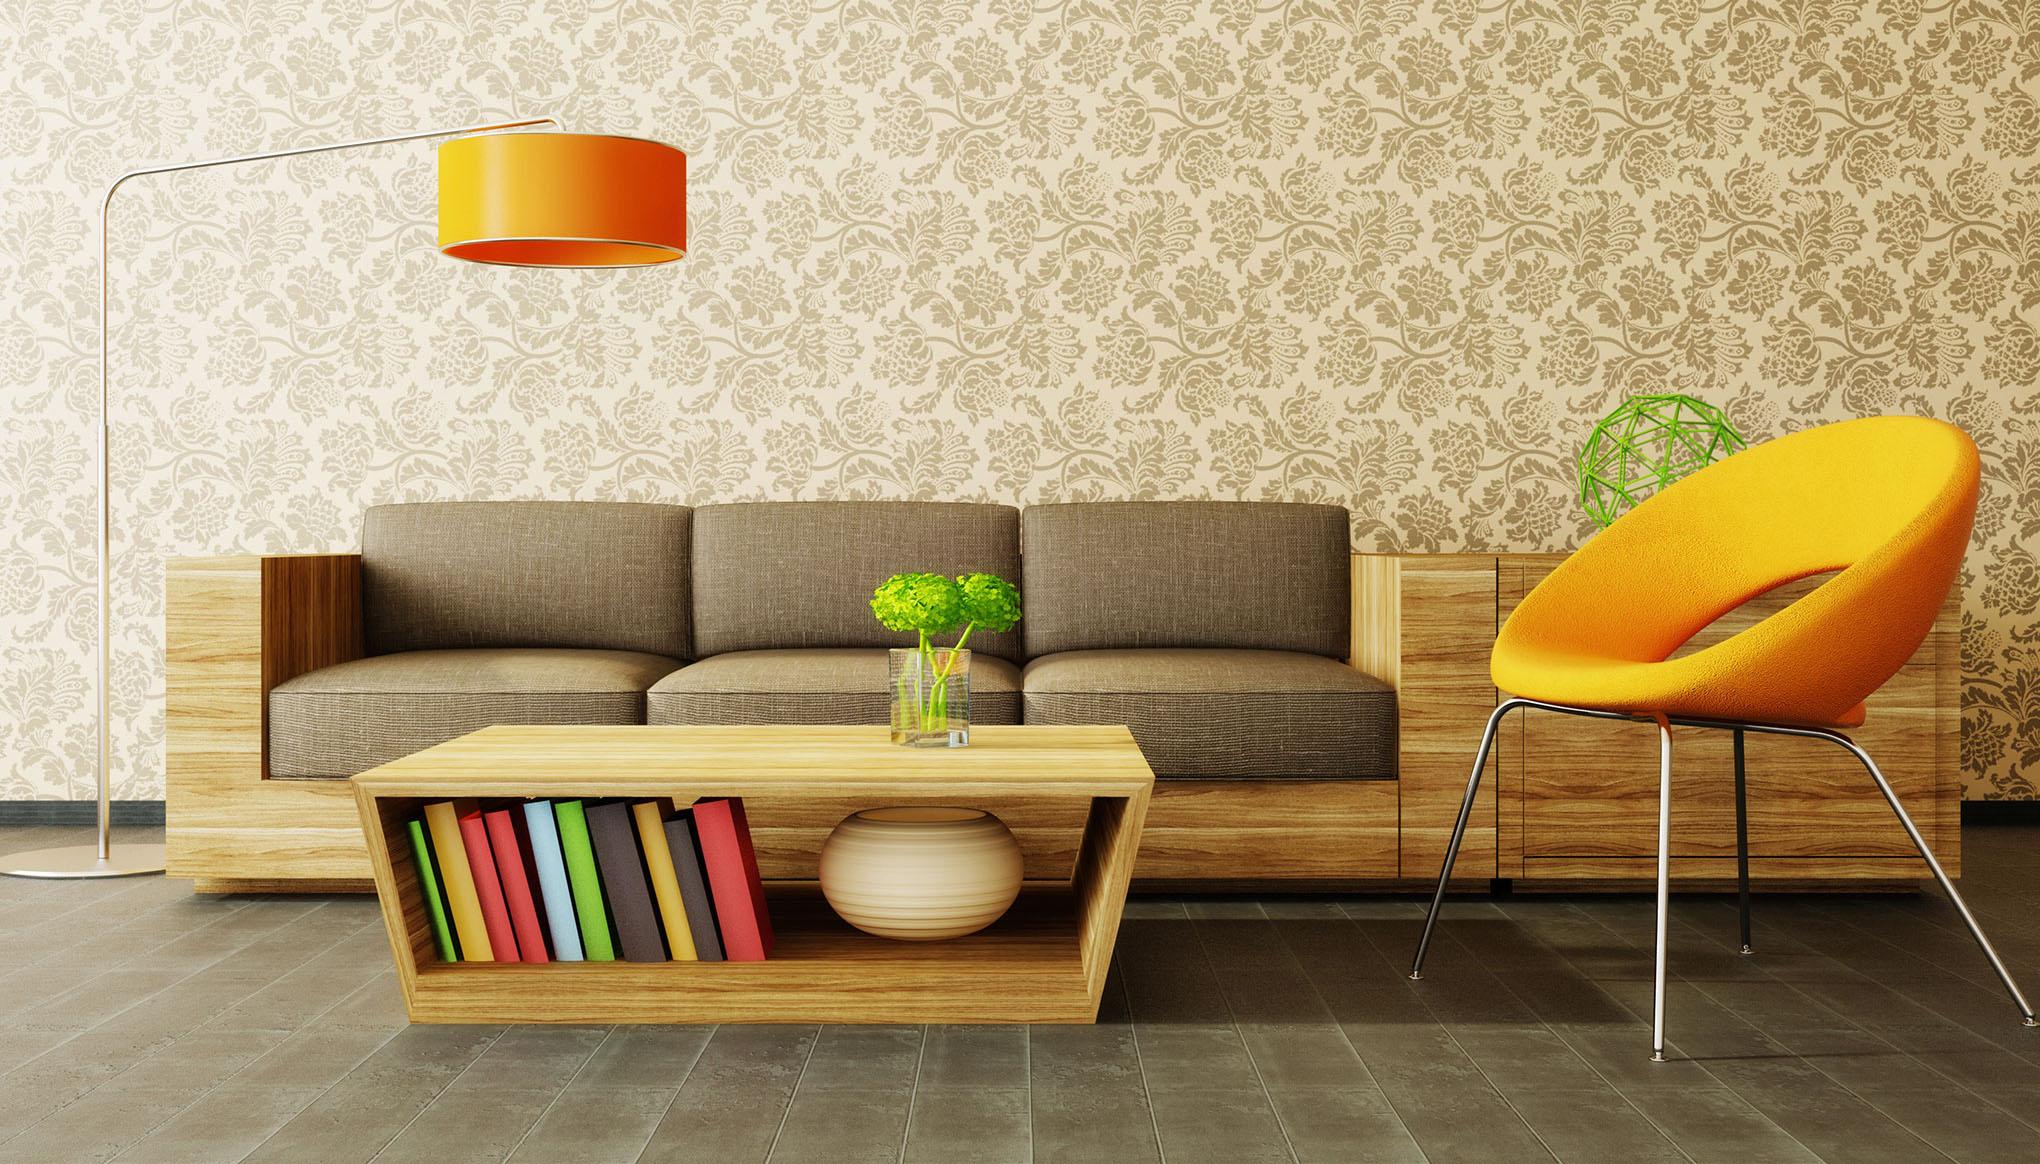 Wallpaper Mistakes to Avoid